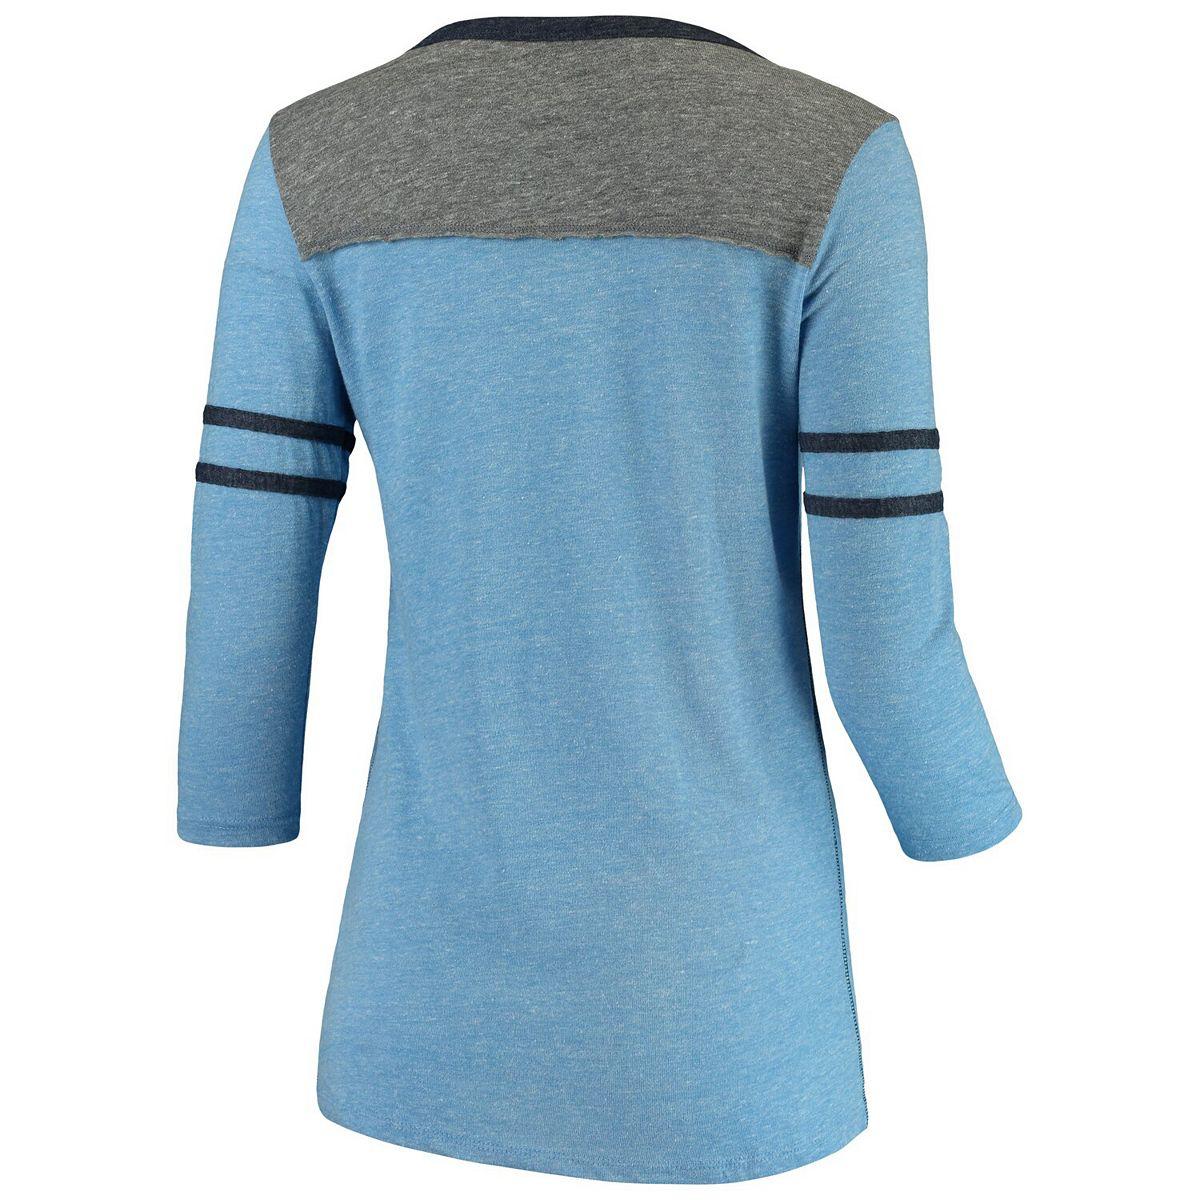 Women's 5th & Ocean by New Era Heathered Carolina Blue/Heathered Gray North Carolina Tar Heels Split Neck 3/4-Sleeve Stripe Tri-Blend T-Shirt A9vot